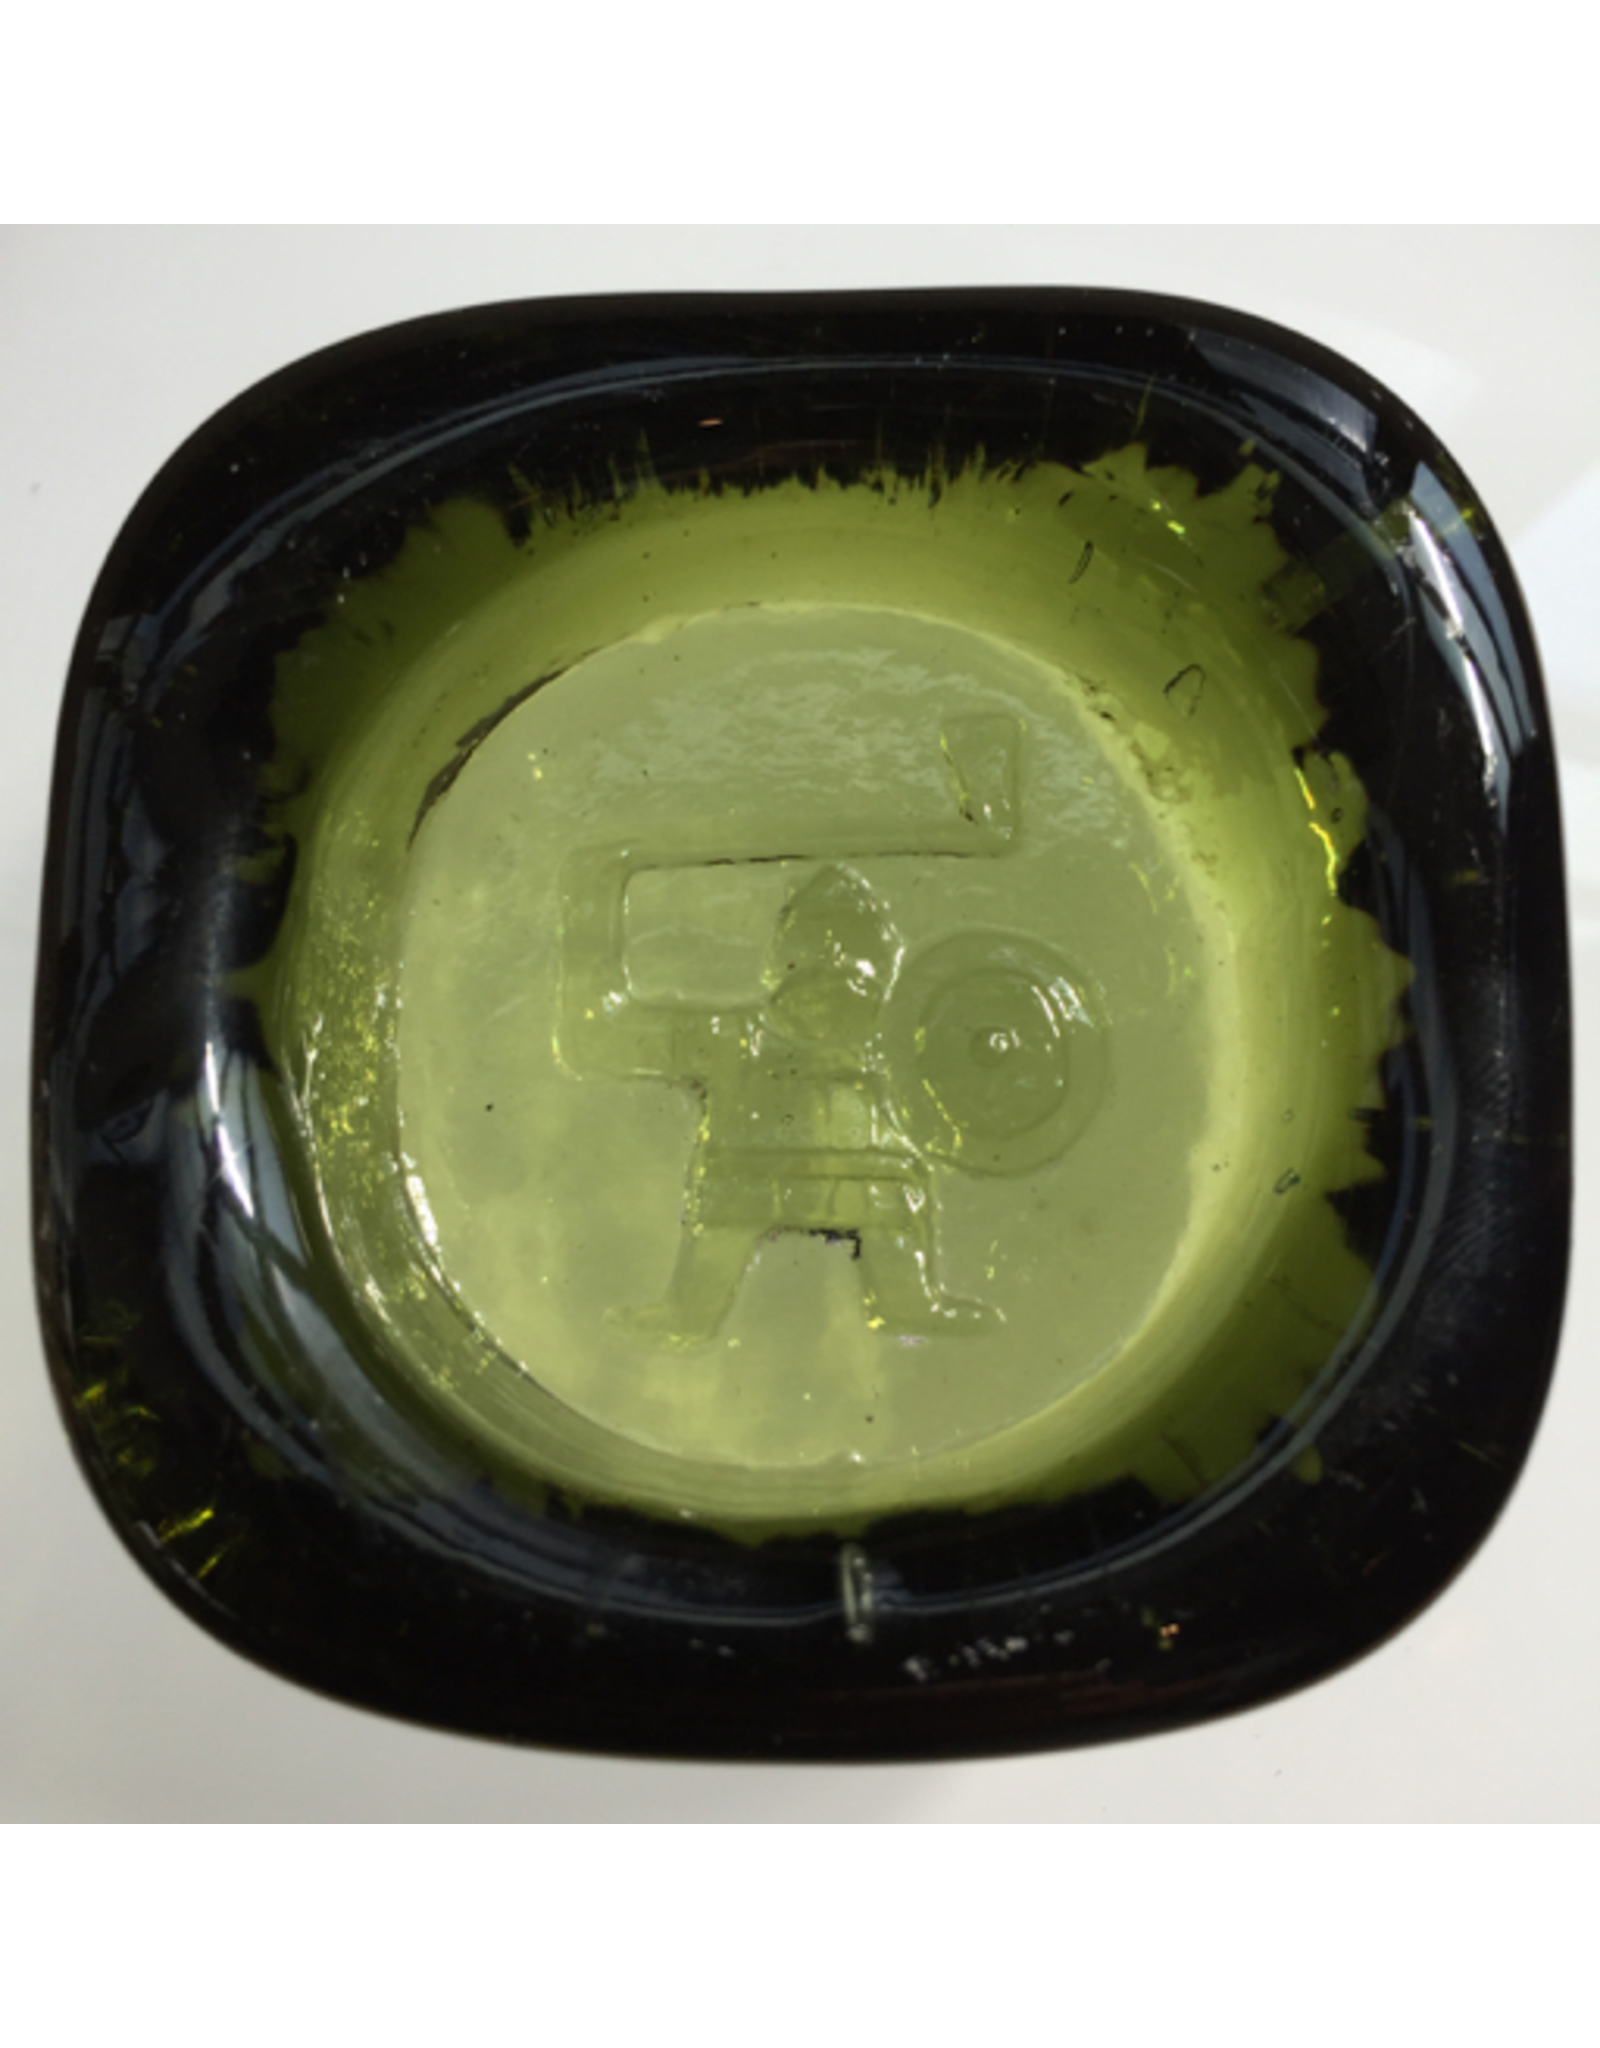 MANKS ANTIQUES GREEN GLASS VIKING ICON BY EIRK HOGLUND FOR BODA SWEDEN, W7 X L7 X D2CM